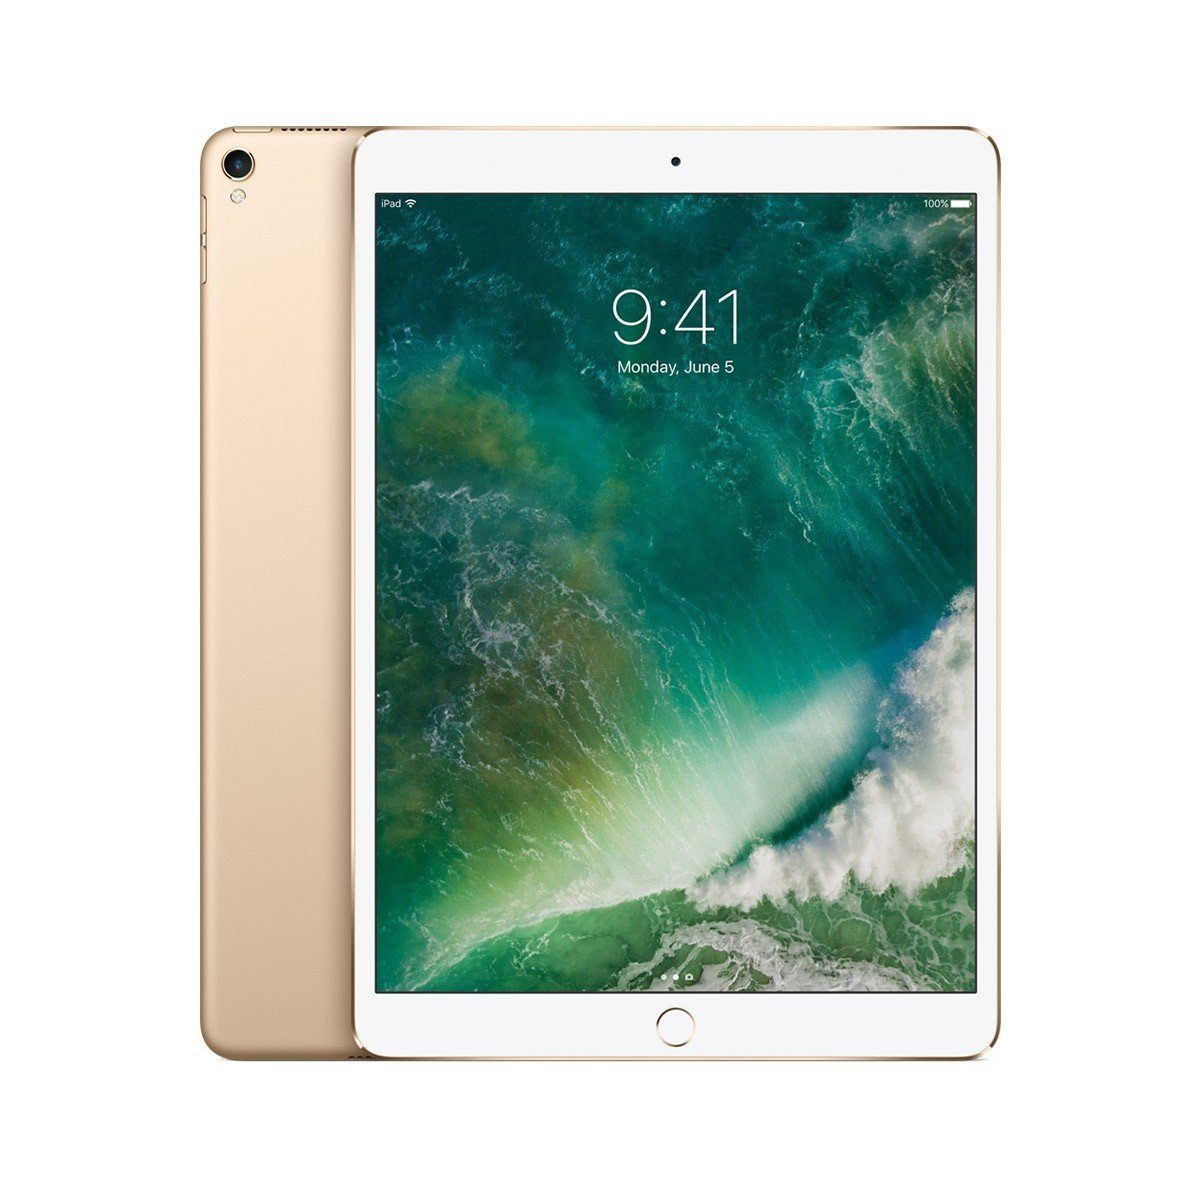 iPad Pro 10.5-inch Gold